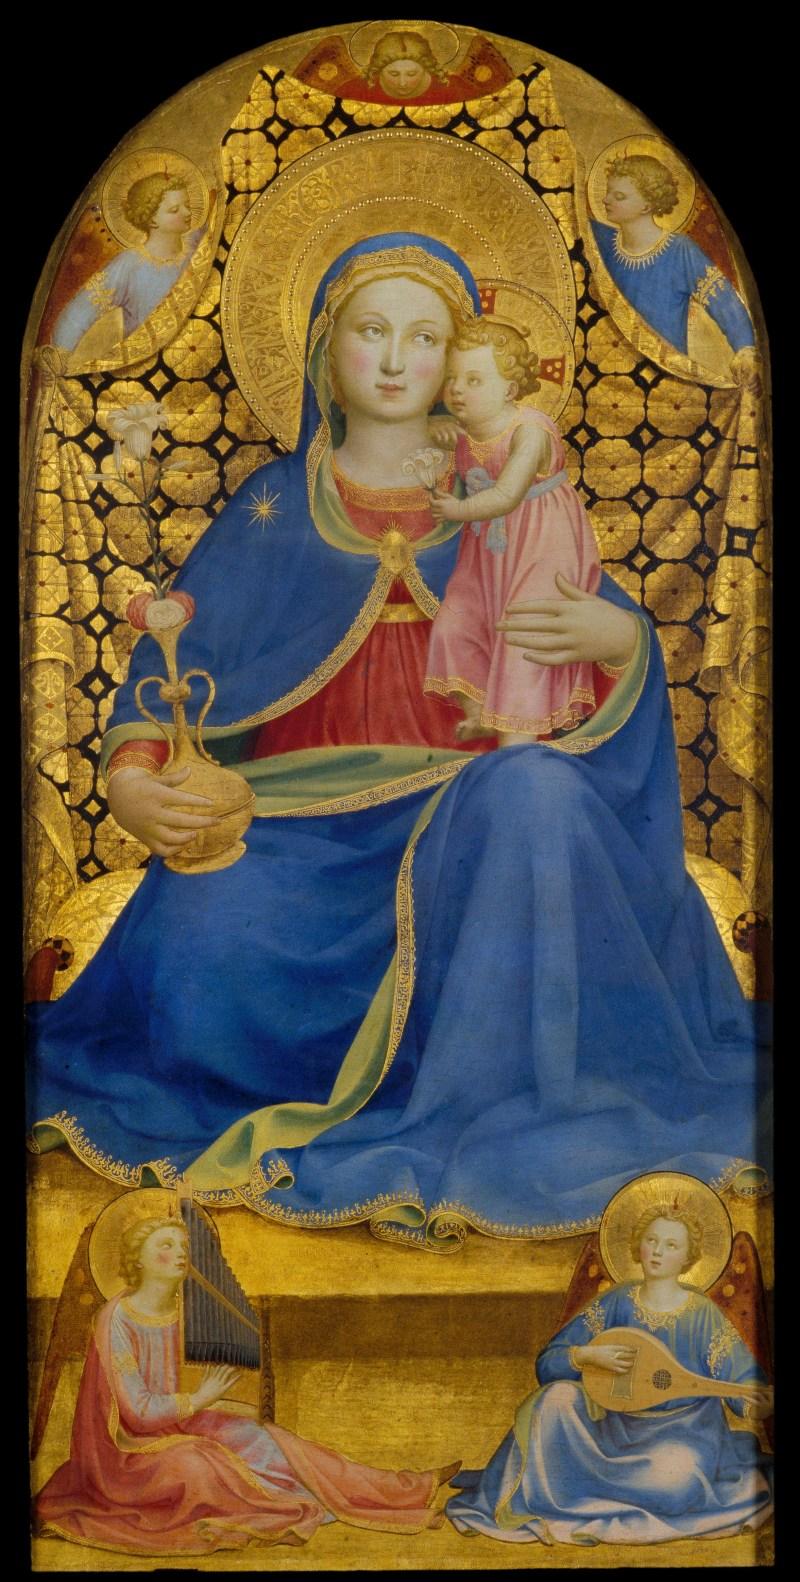 Madonna of Humility, by Fra Angelico, c. 1433-35. Museu Nacional d'Art de Catalunya, Barcelona, Spain. Via IllustratedPrayer.com